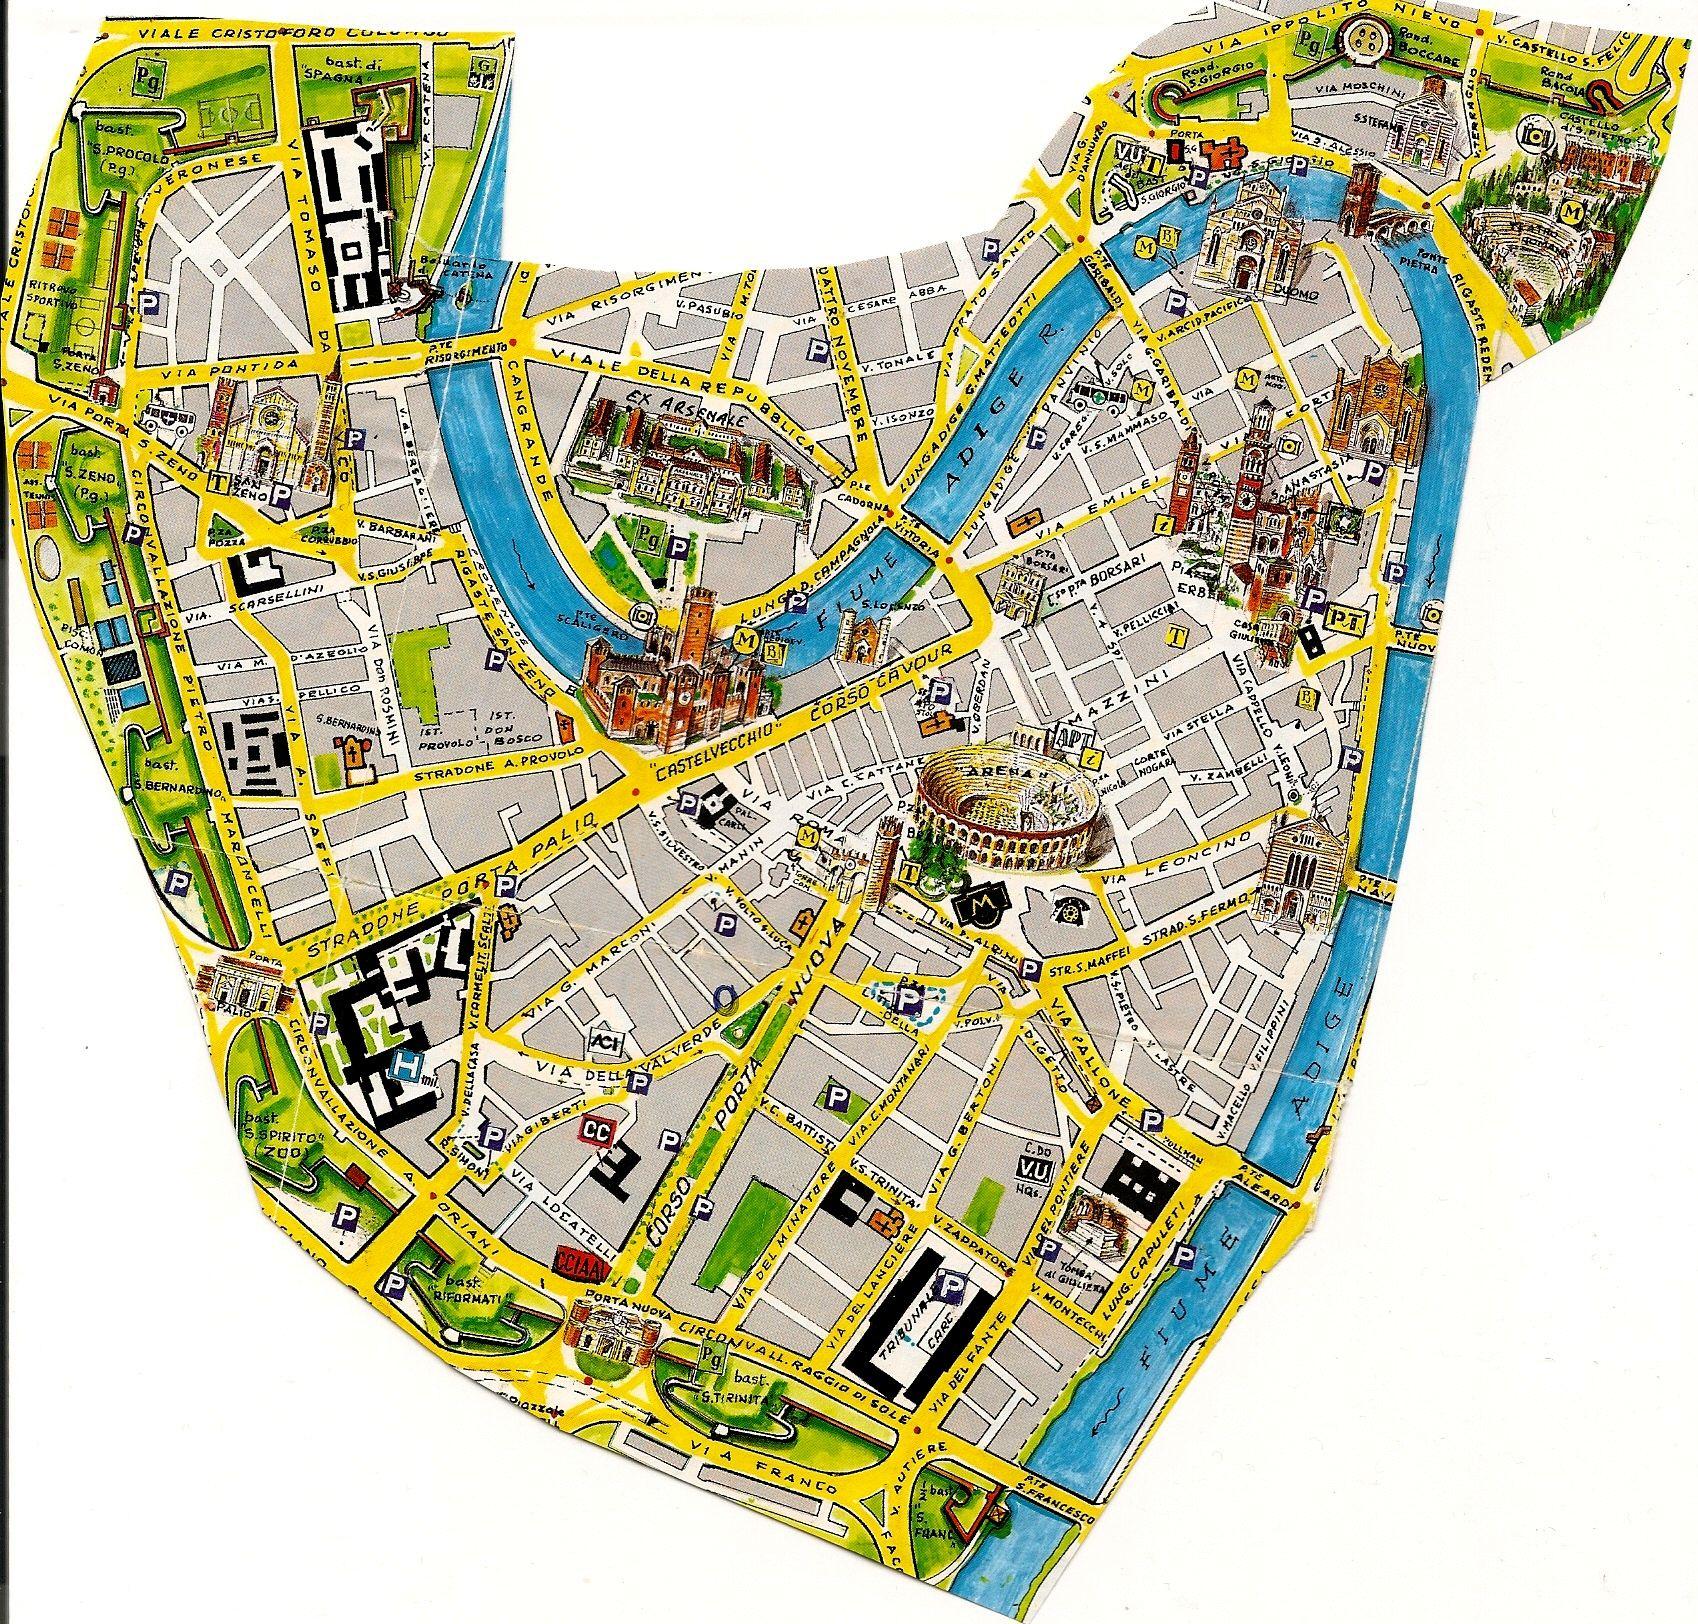 map of Verona Italy PISA FLORENCE SIENNA SAN GIMIGNANO